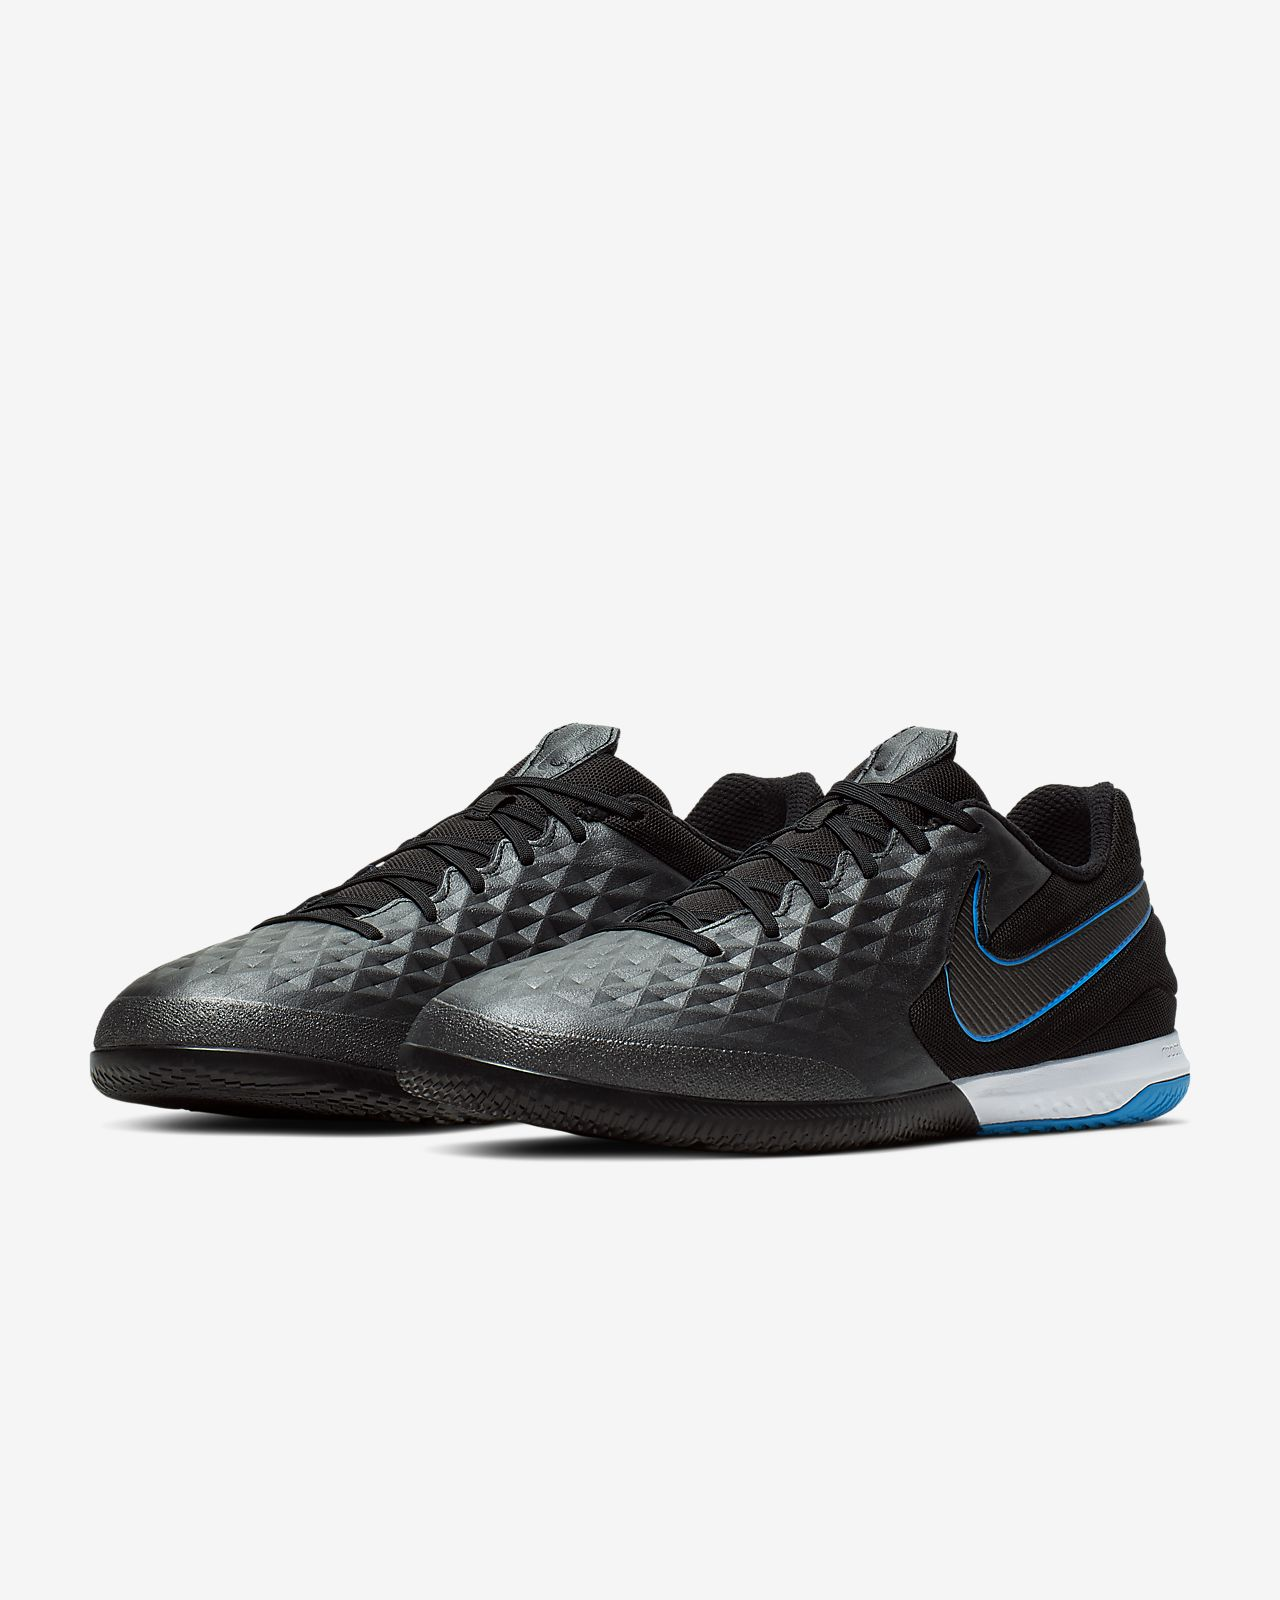 7228578fa68f5 Nike React Tiempo Legend 8 Pro IC Indoor/Court Soccer Shoe. Nike.com